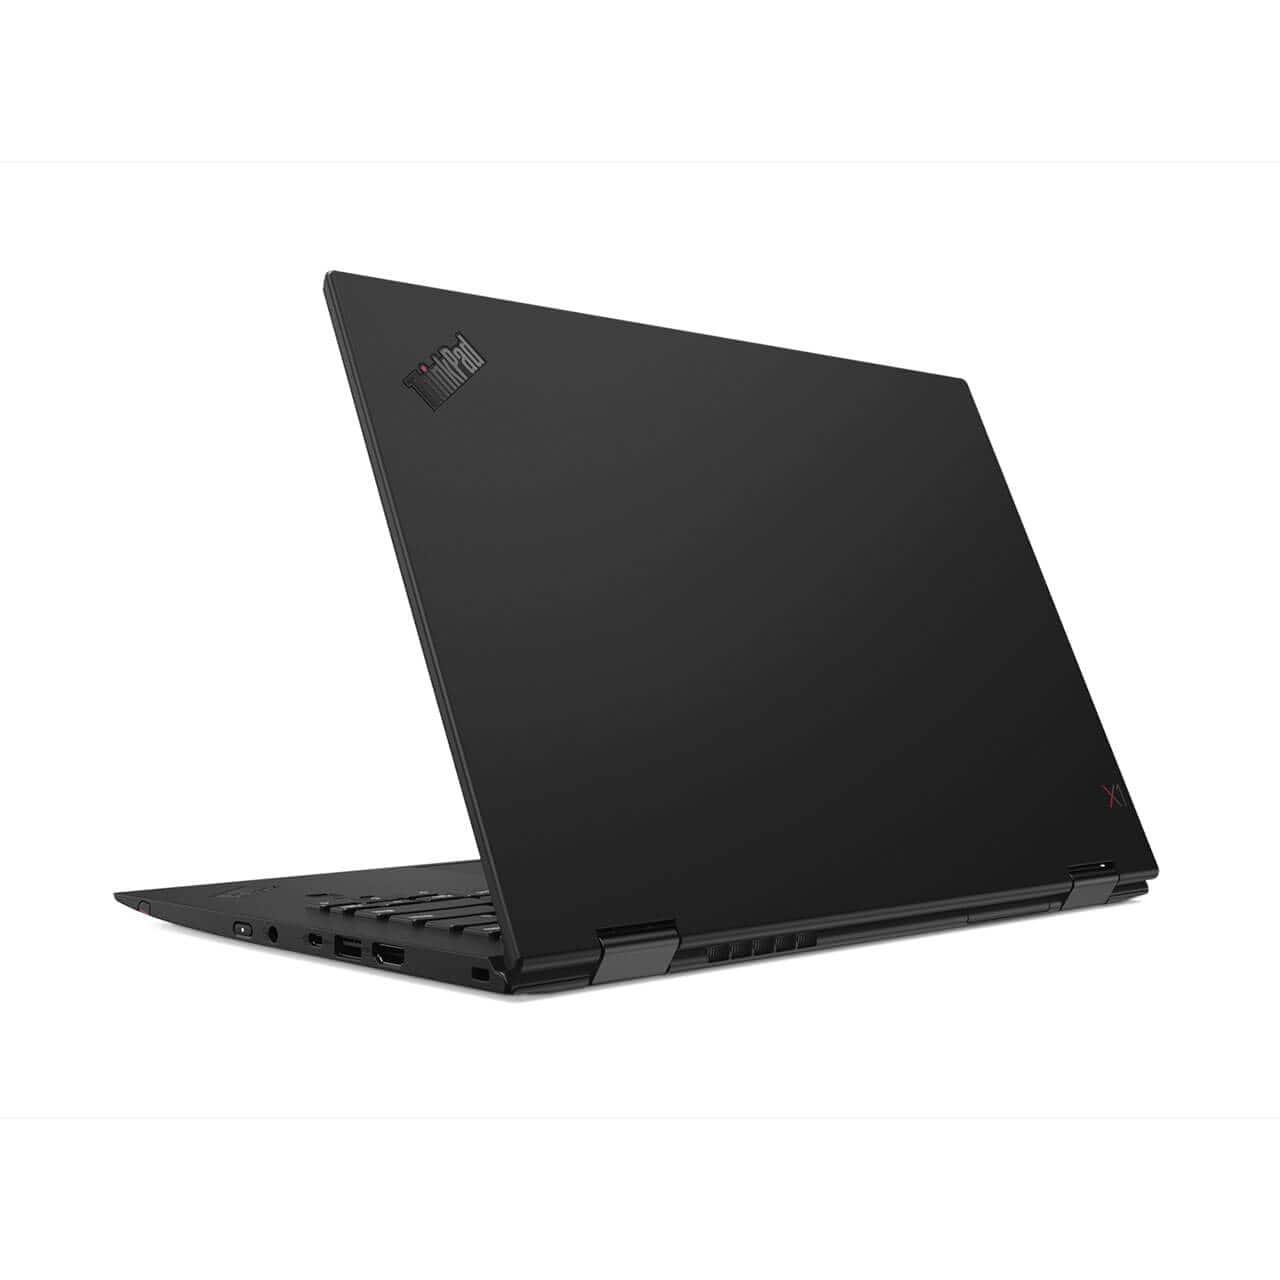 "Lenovo ThinkPad X1 Yoga 3rd Generation, 14.0"", i7-8650U, 16 GB RAM, 512GB SSD, Win 10 Pro 64 4"